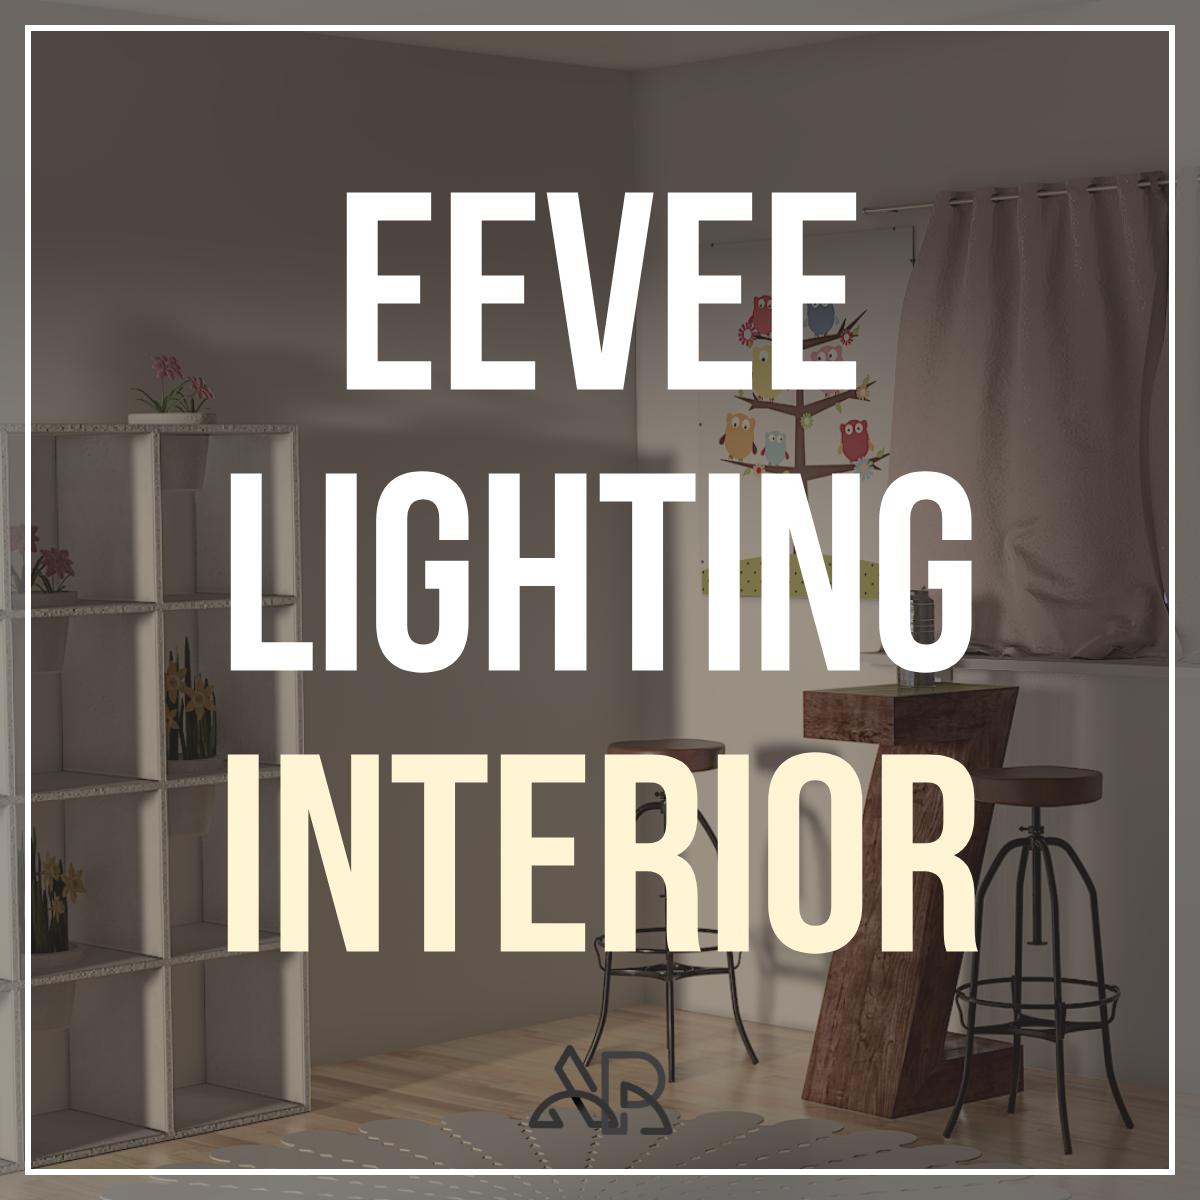 Eevee lighting interior